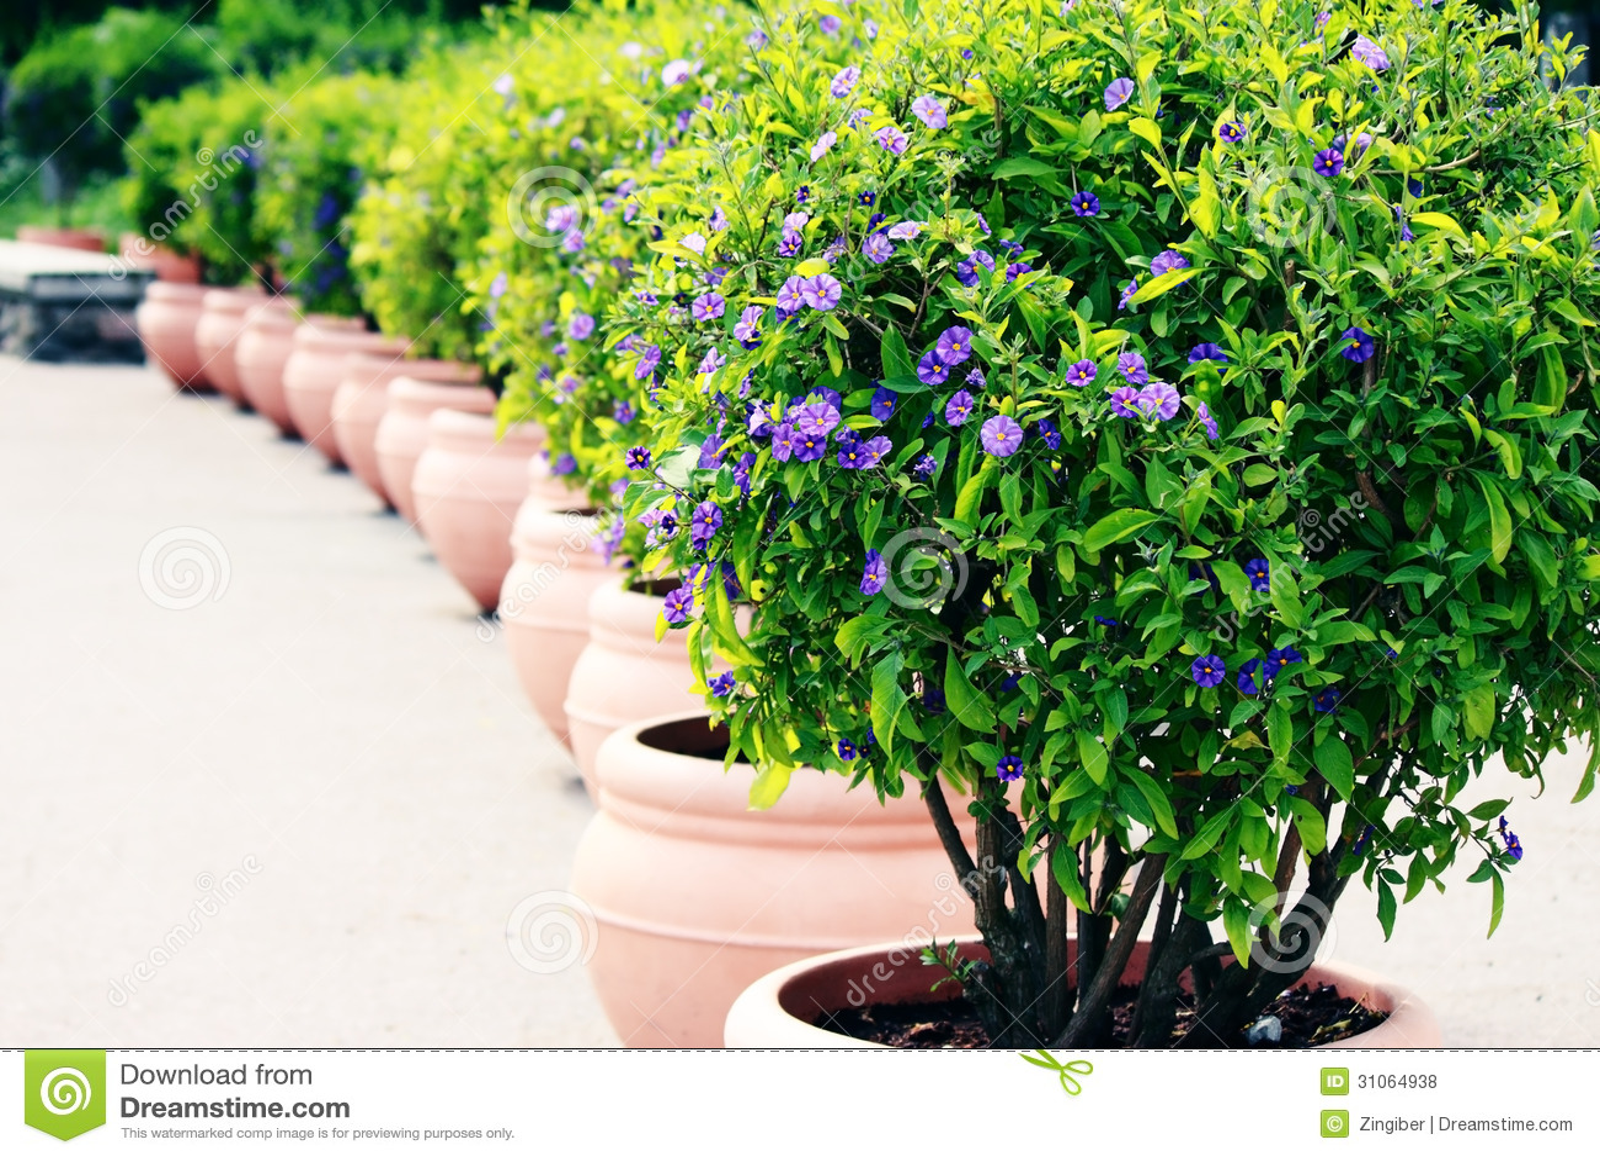 blue potato bush solanum rantonnetii royalty free stock. Black Bedroom Furniture Sets. Home Design Ideas